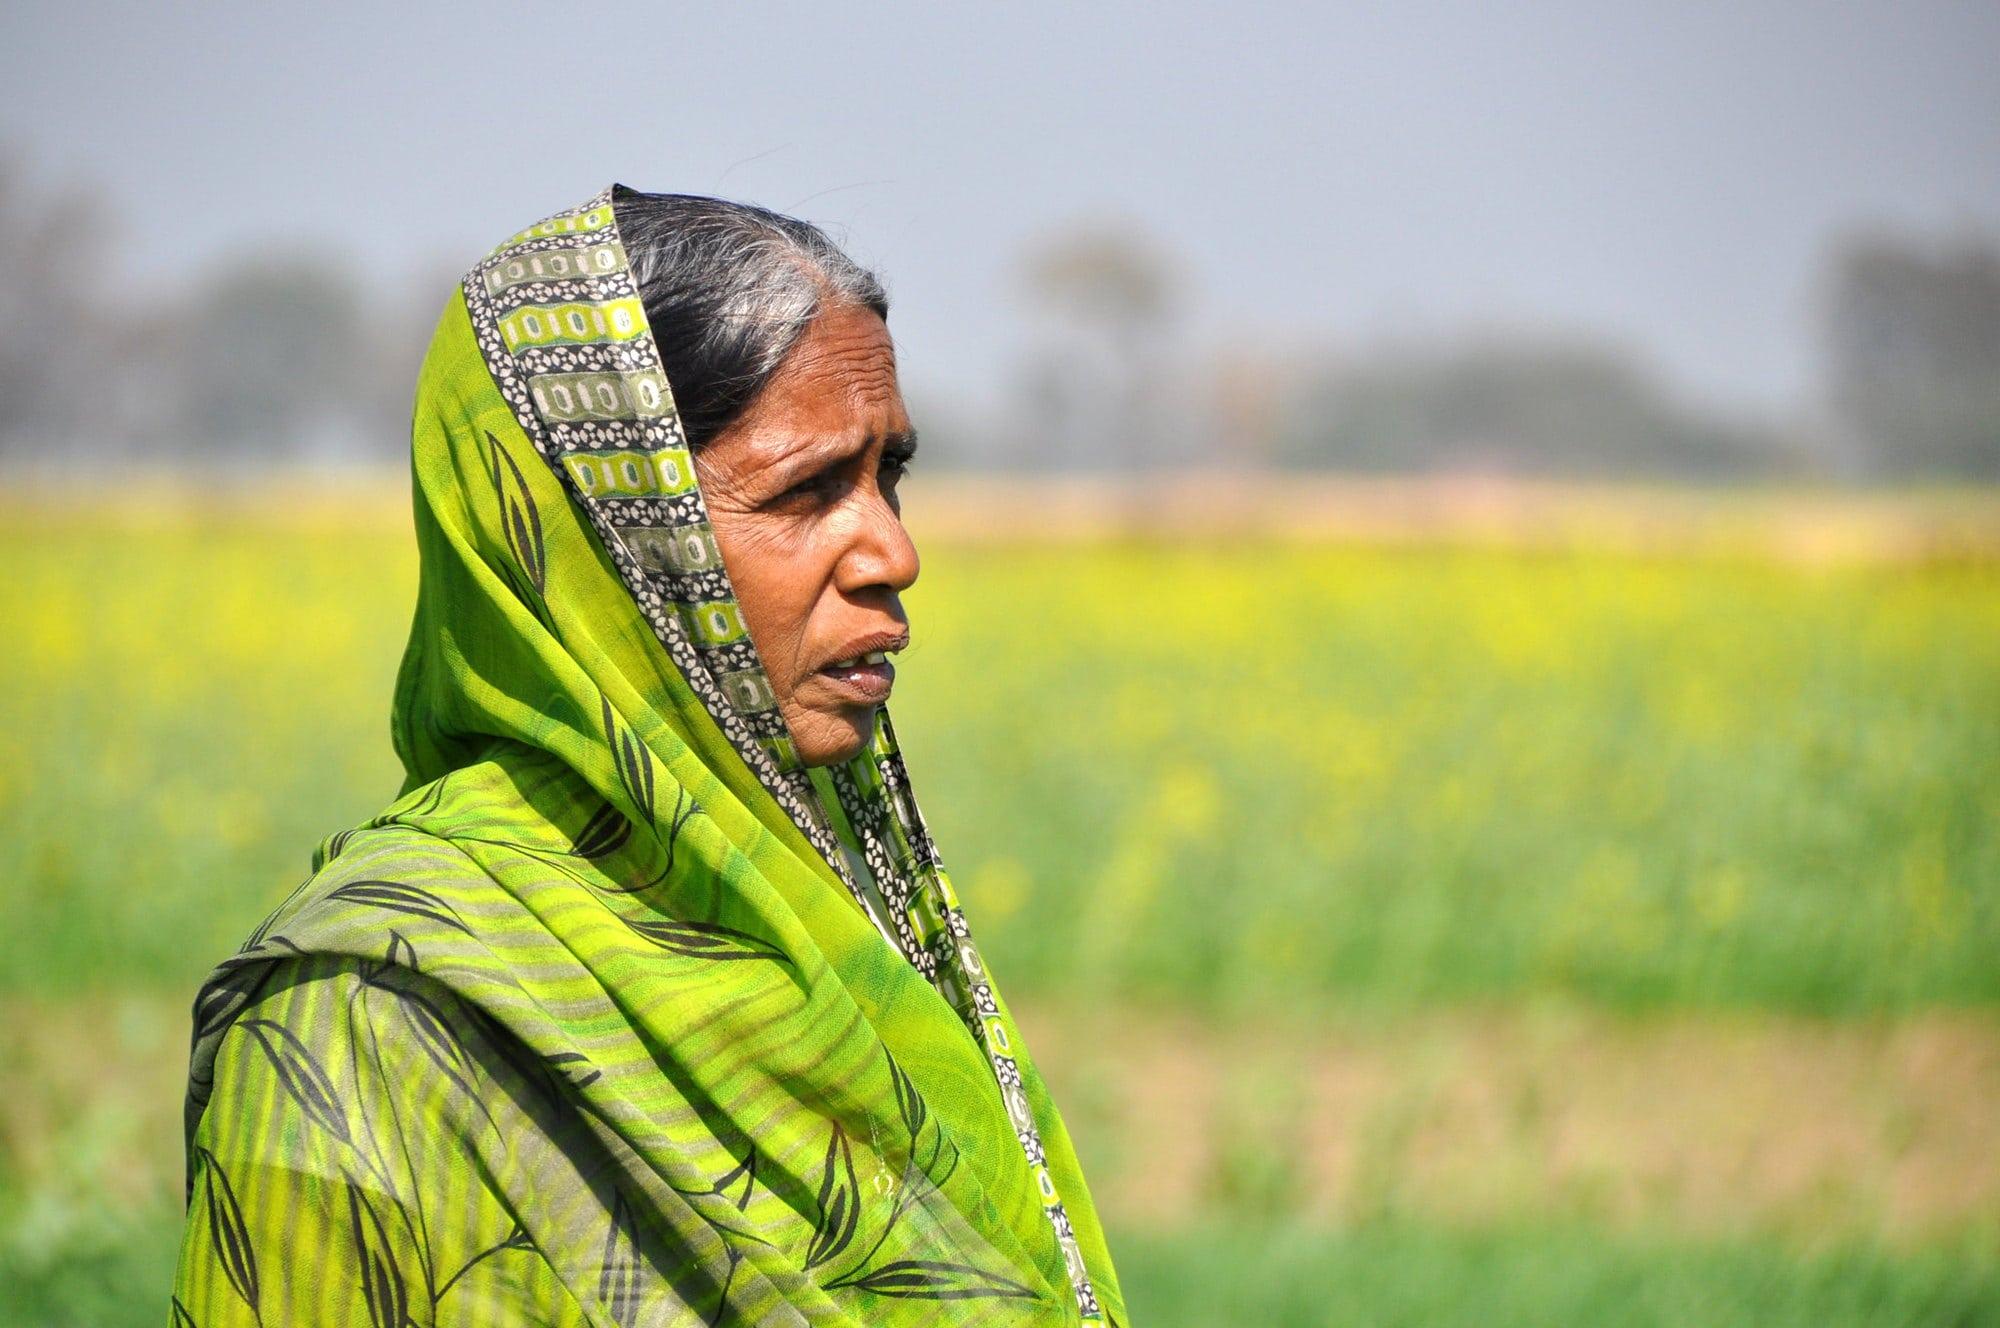 Indian farmer. Photo: CCAFS.